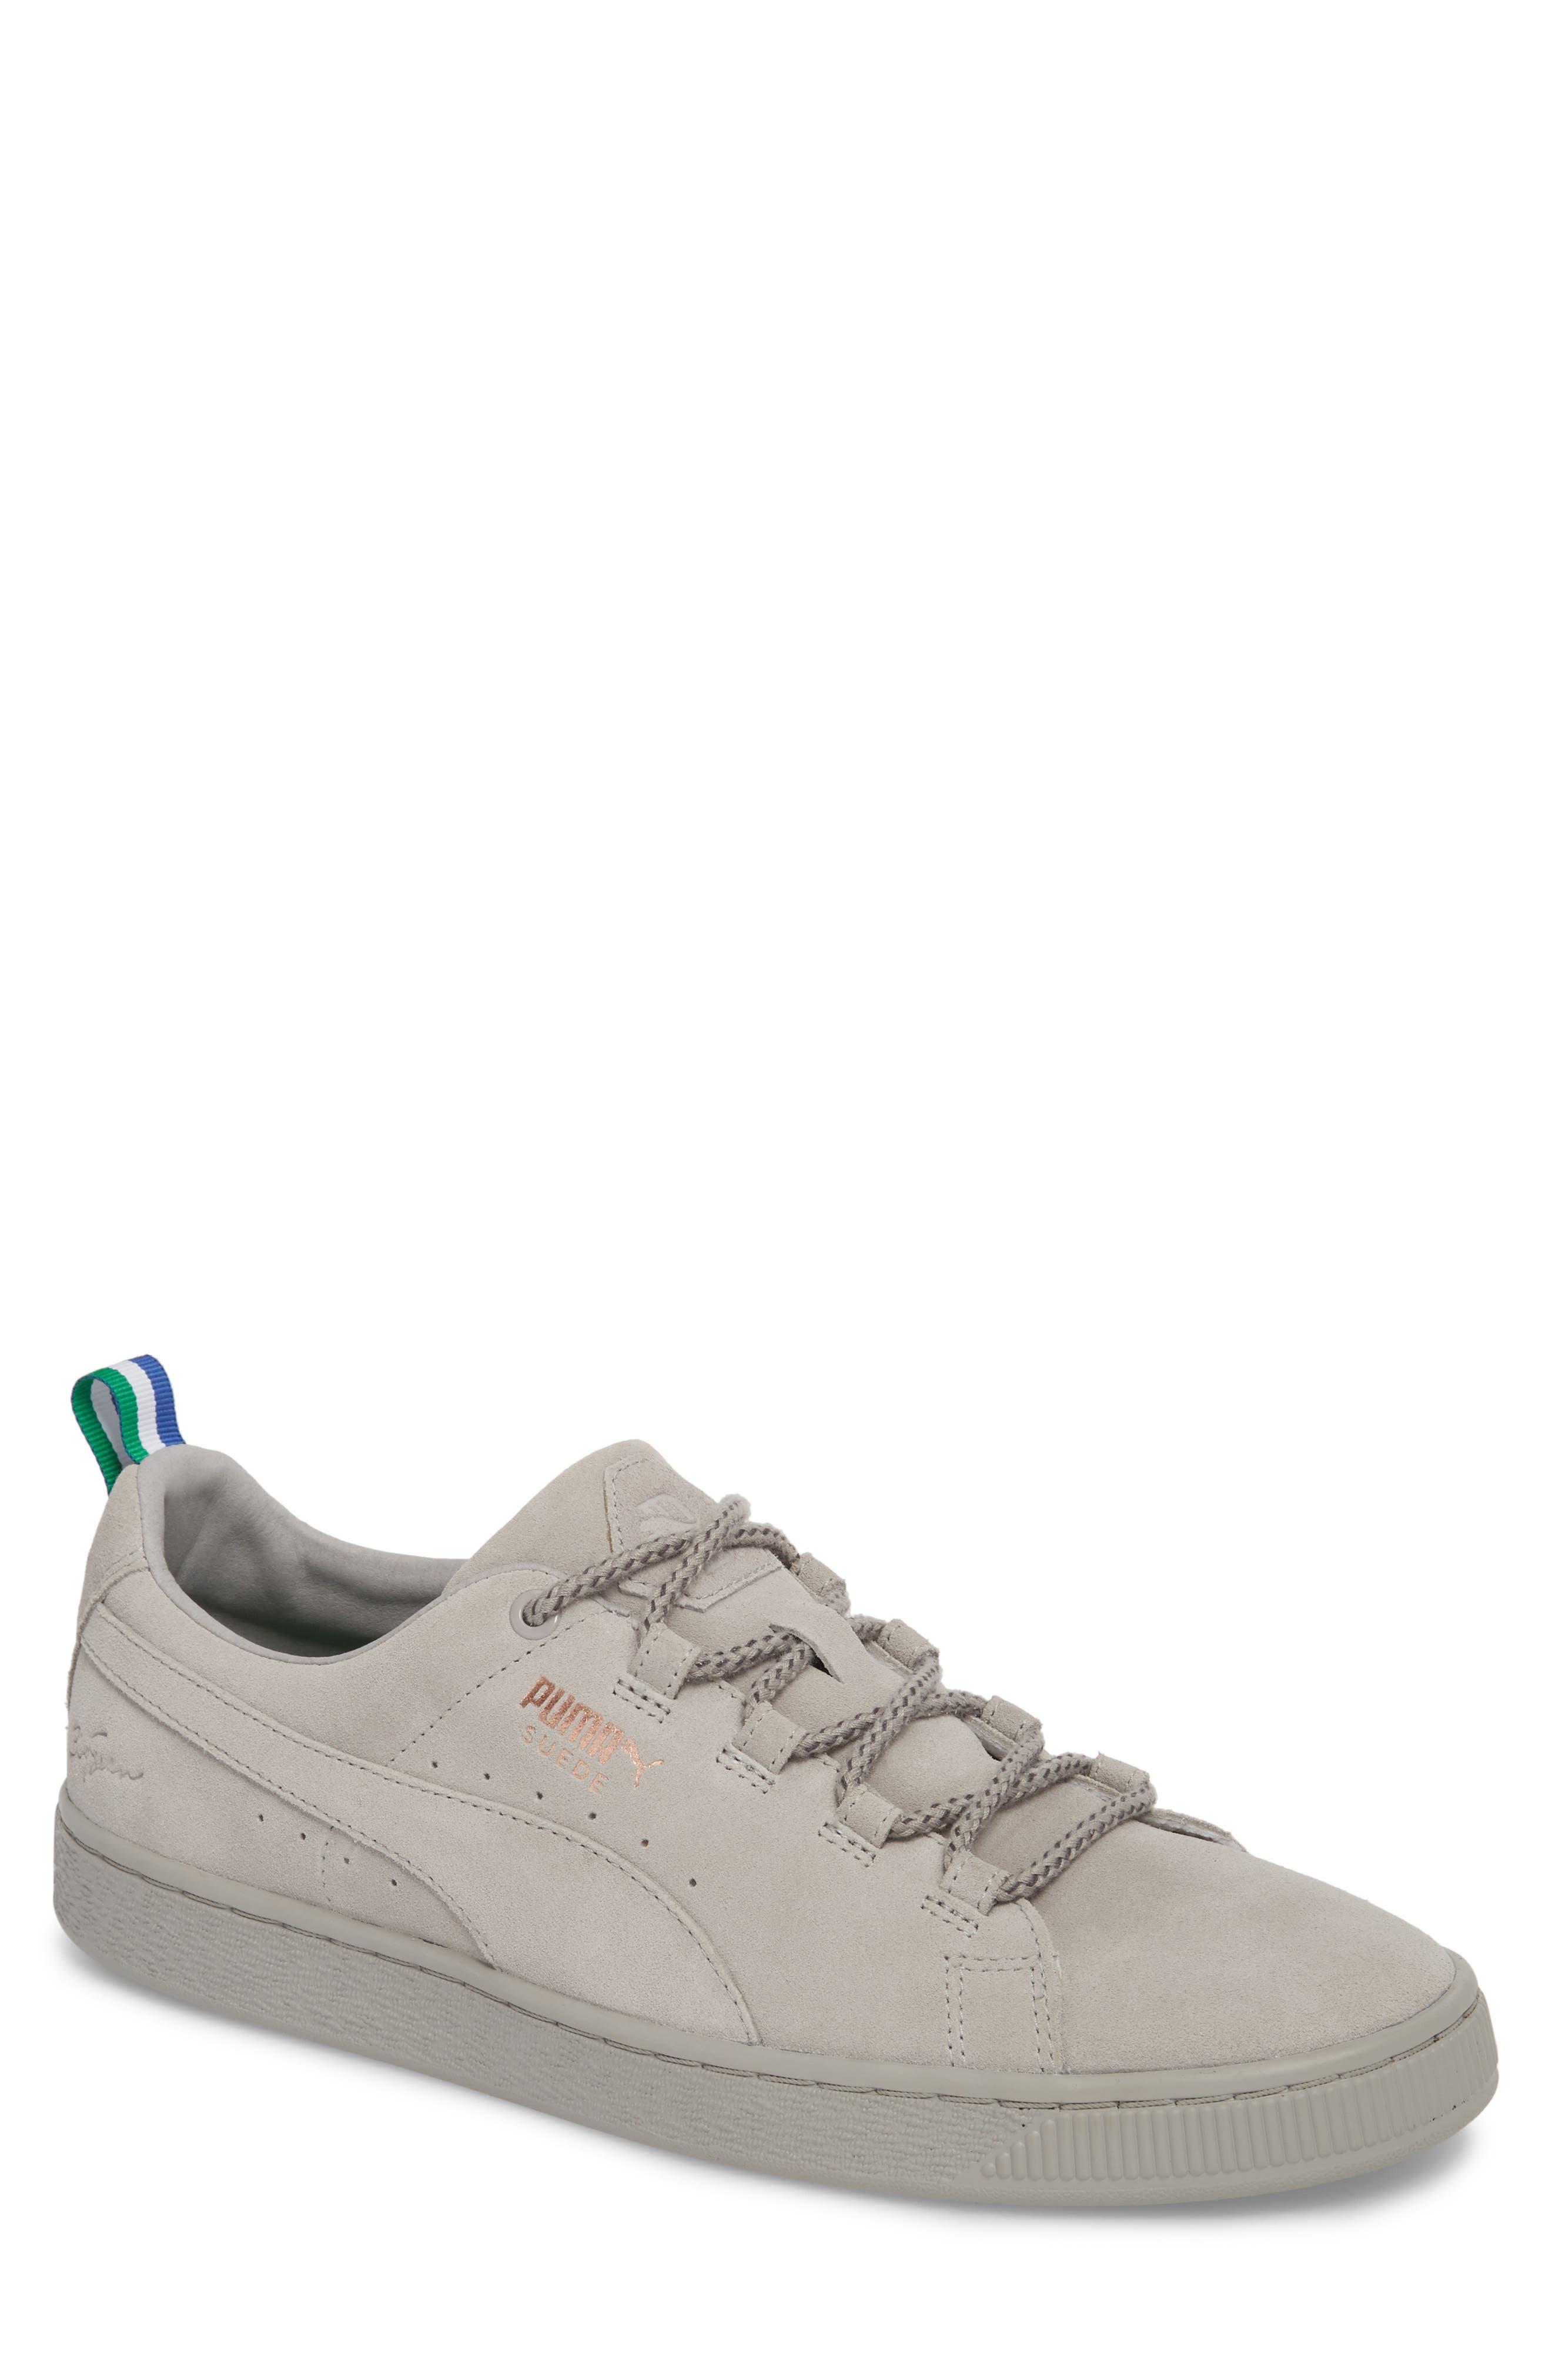 x Big Sean Suede Sneaker,                             Main thumbnail 1, color,                             060